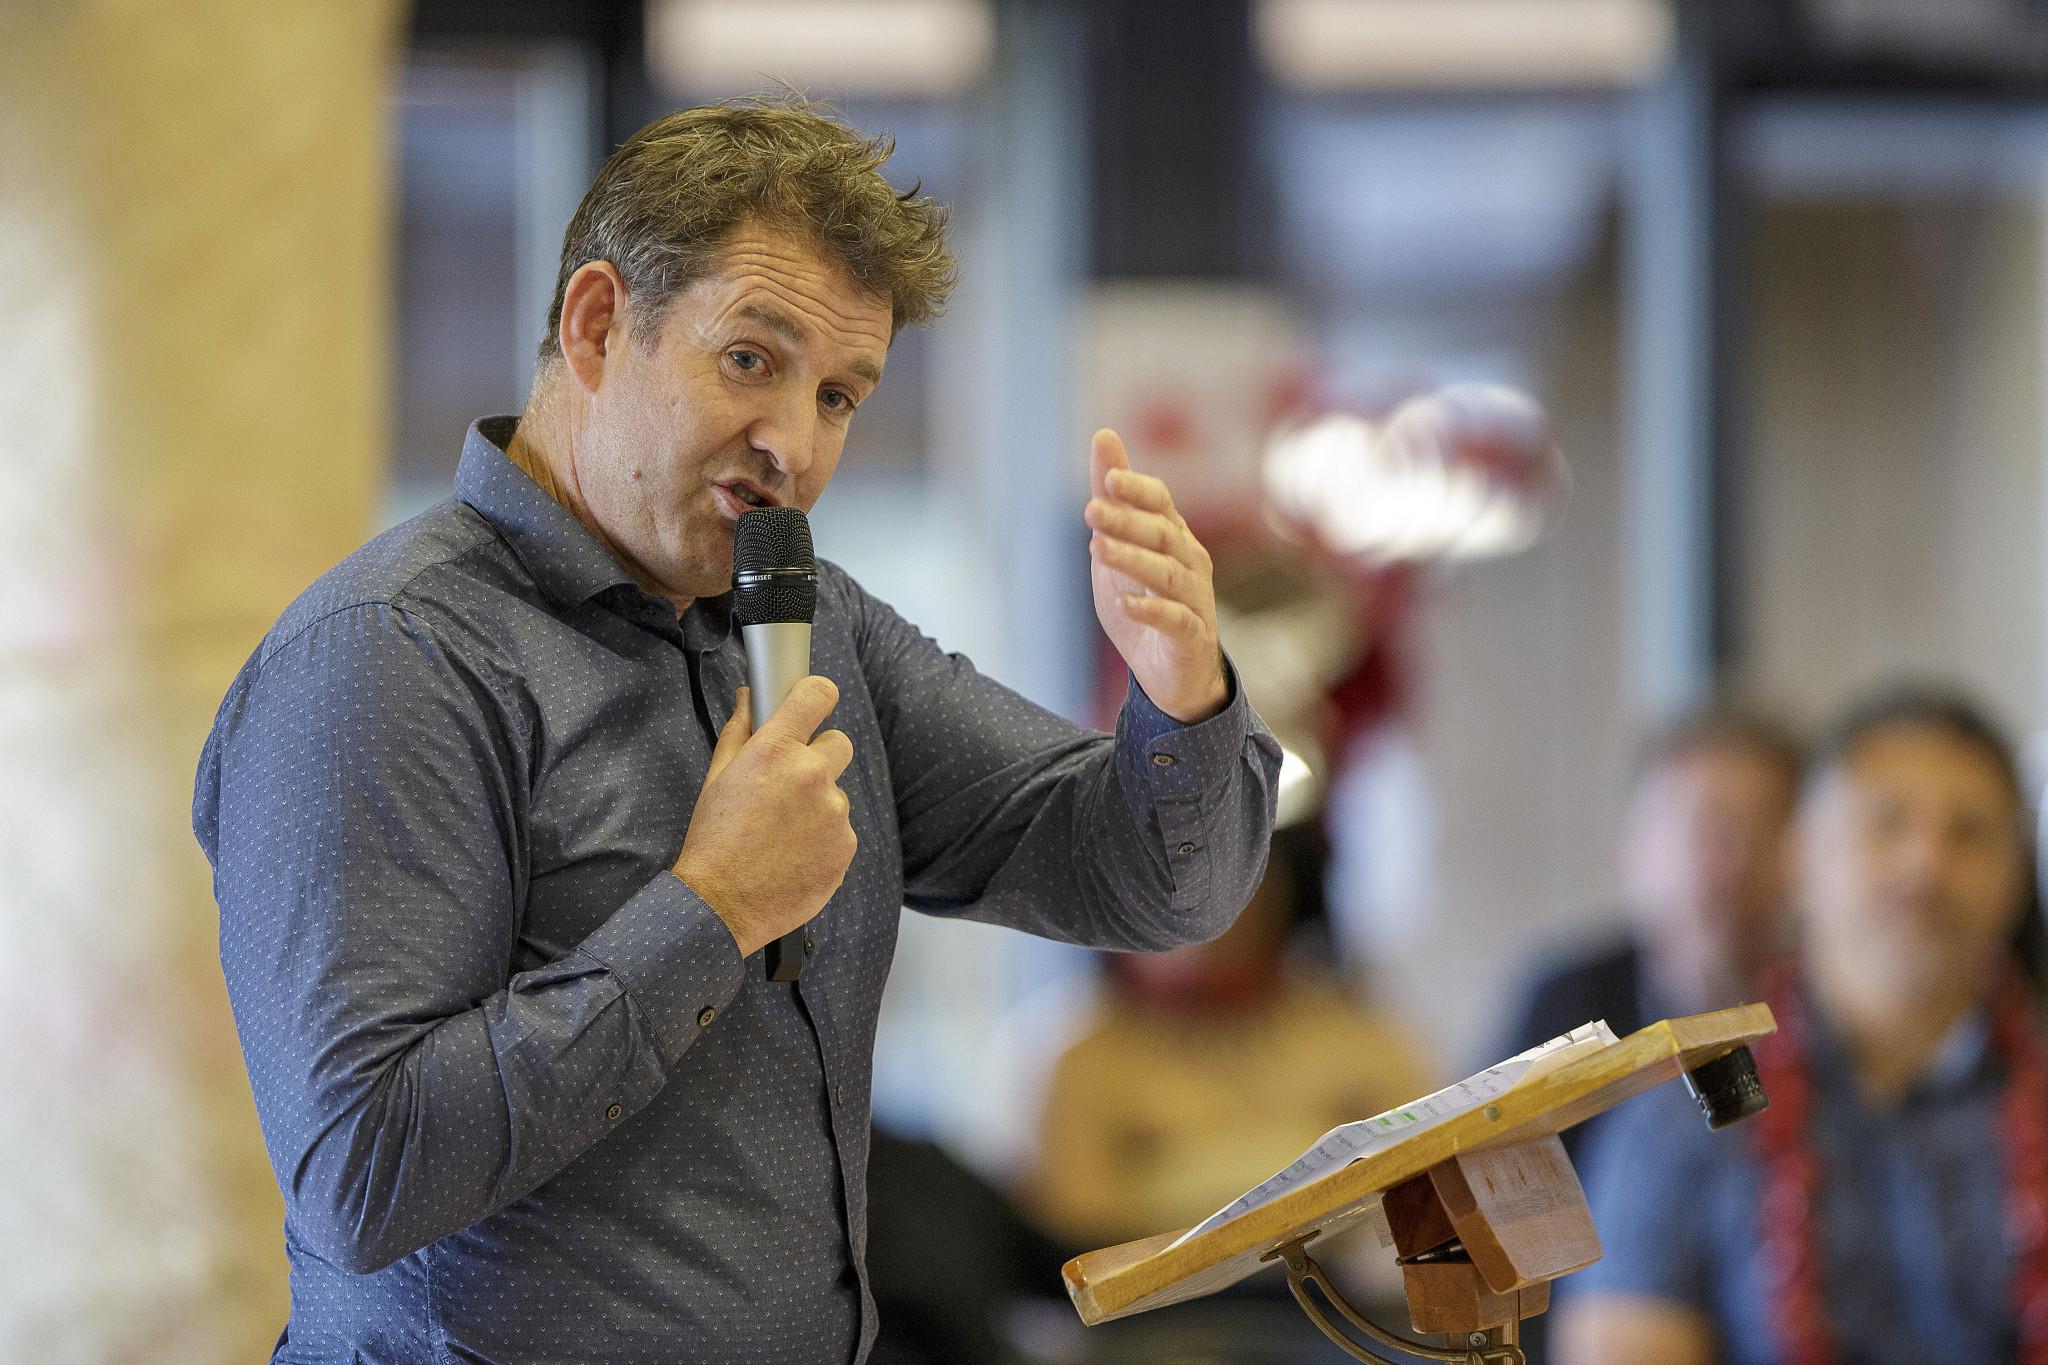 NZ Rugby chief executive Mark Robinson said he was